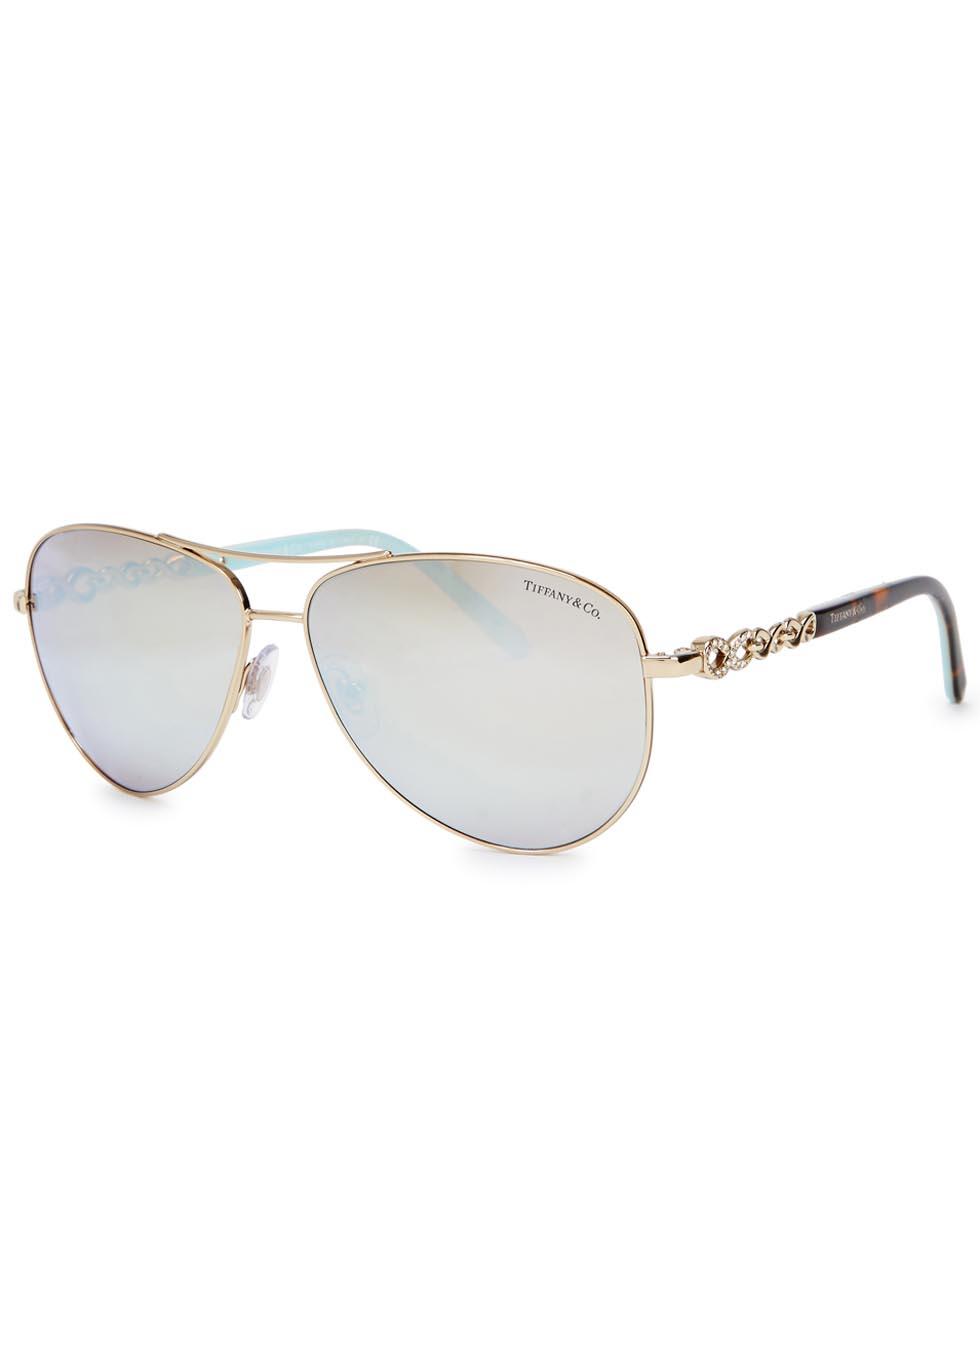 32f9a651ba5 Return To Tiffanytm Aviator Sunglasses « One More Soul